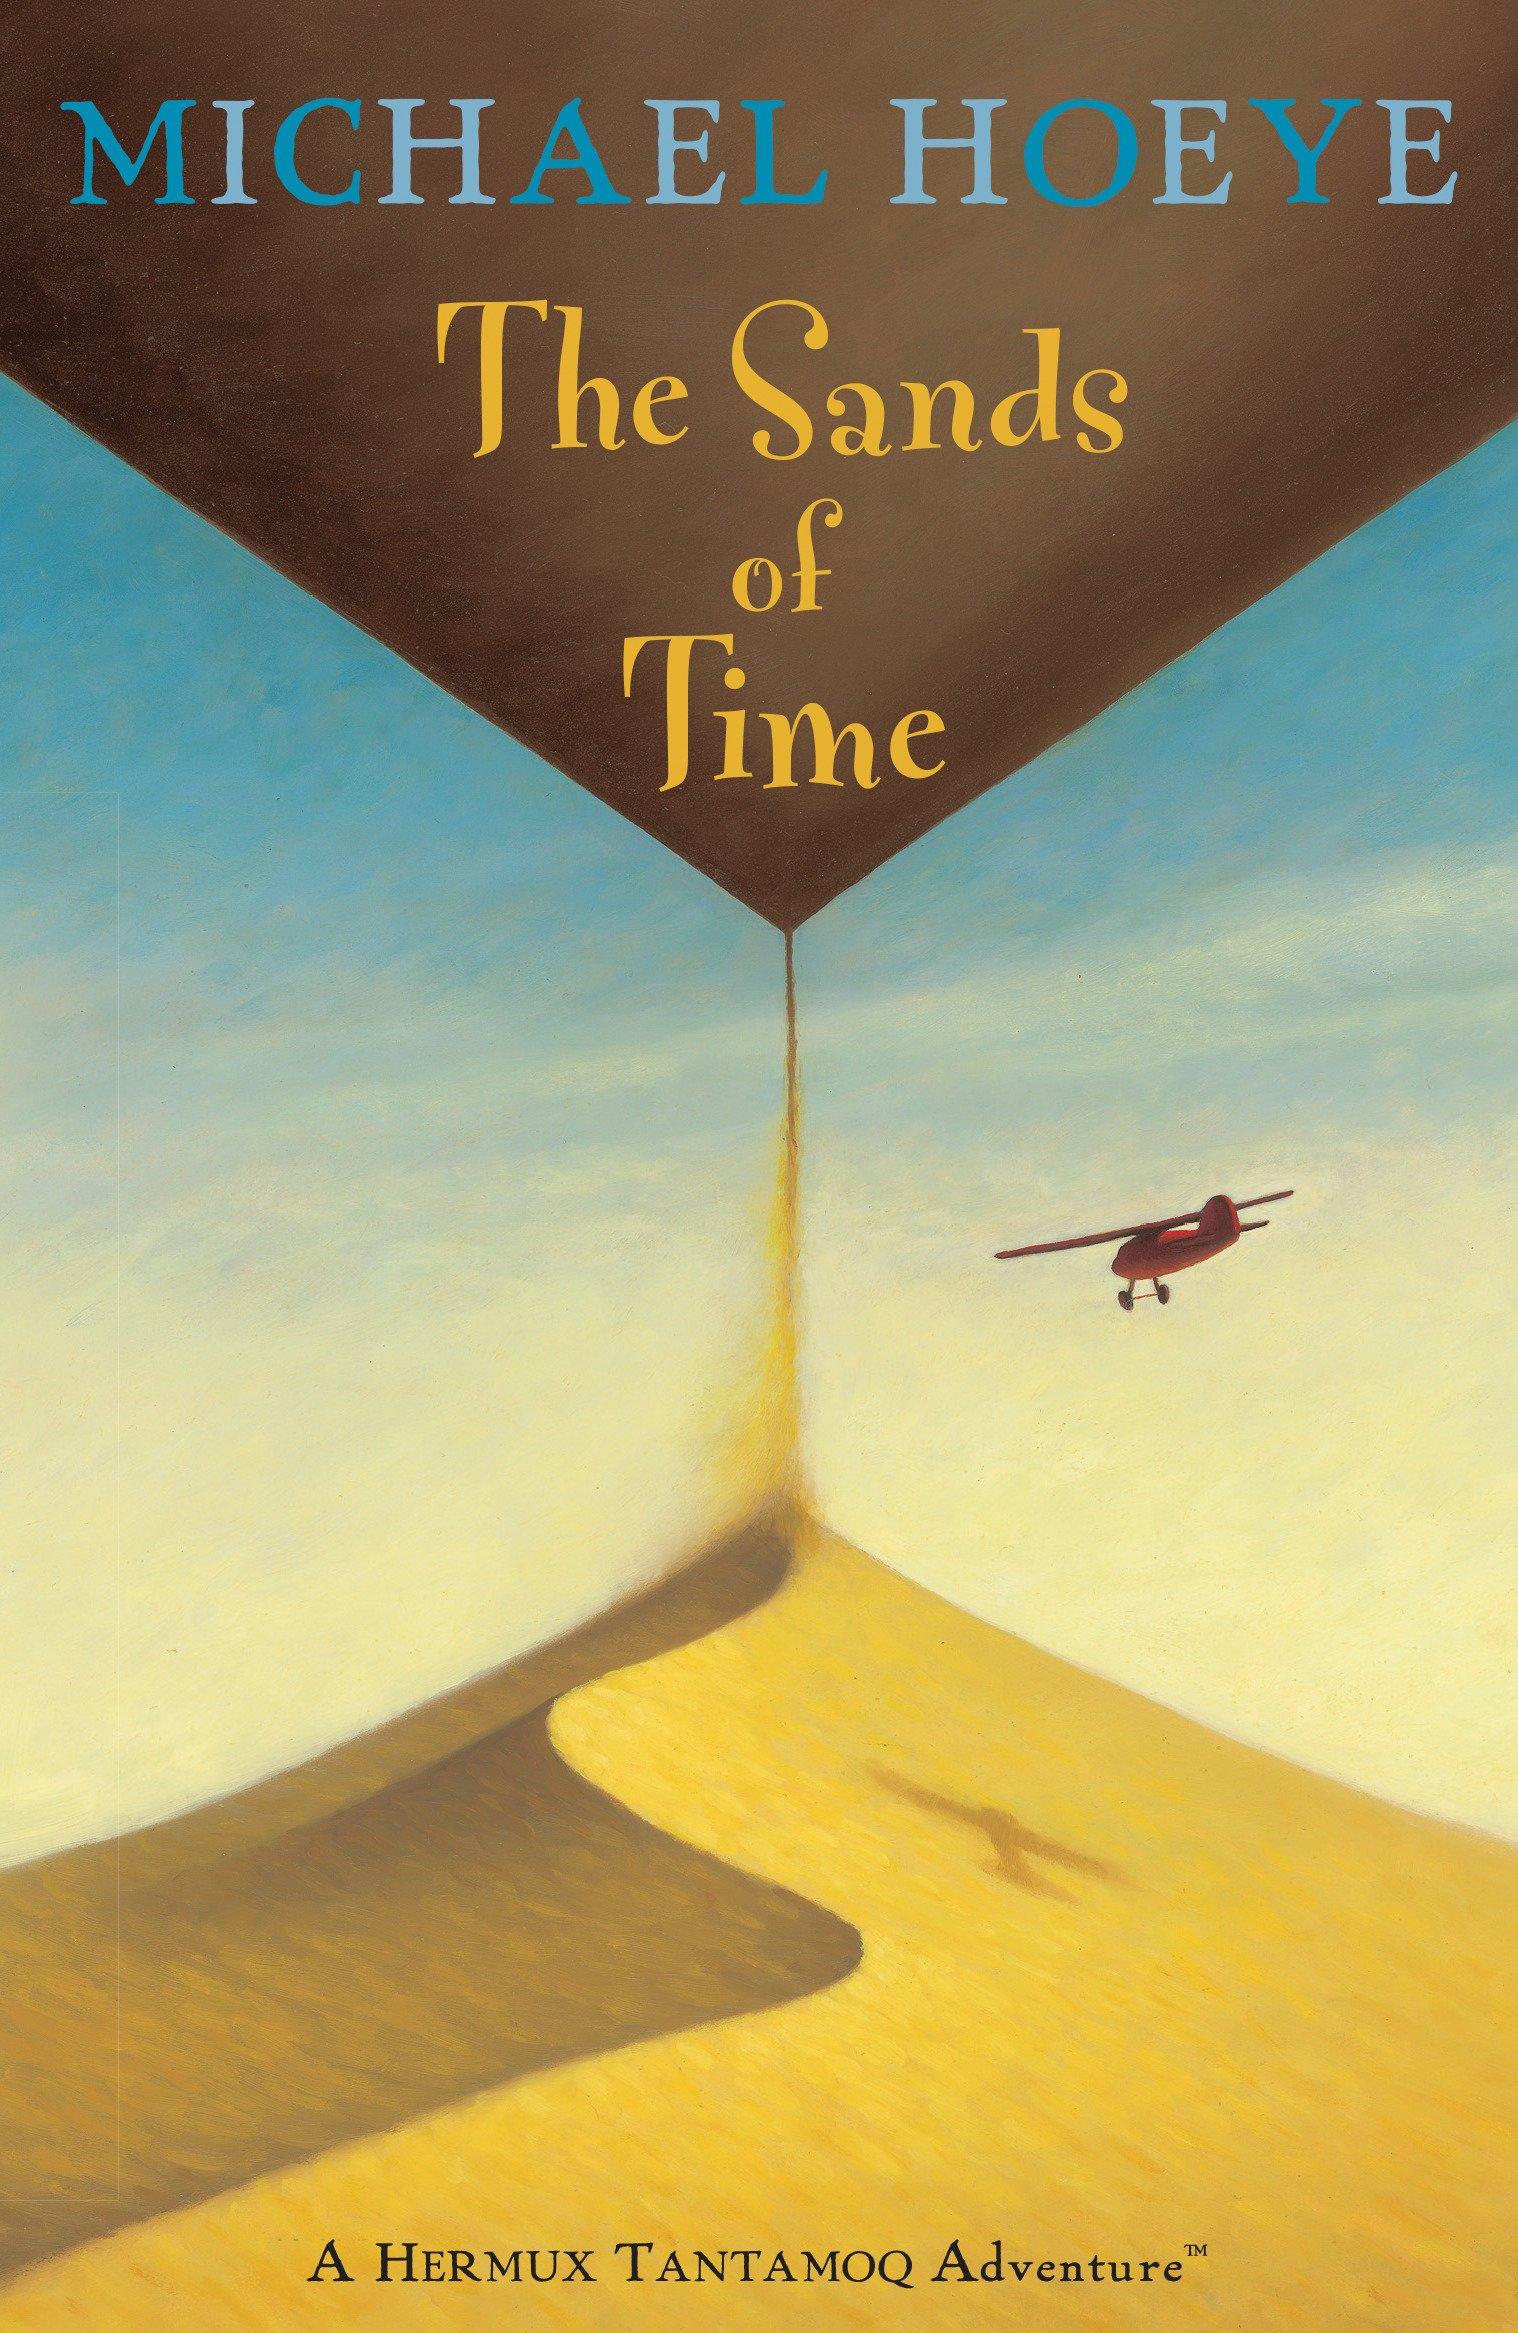 Amazon.com: The Sands of Time (Hermux Tantamoq Adventures (Paperback))  (9780142409831): Michael Hoeye: Books